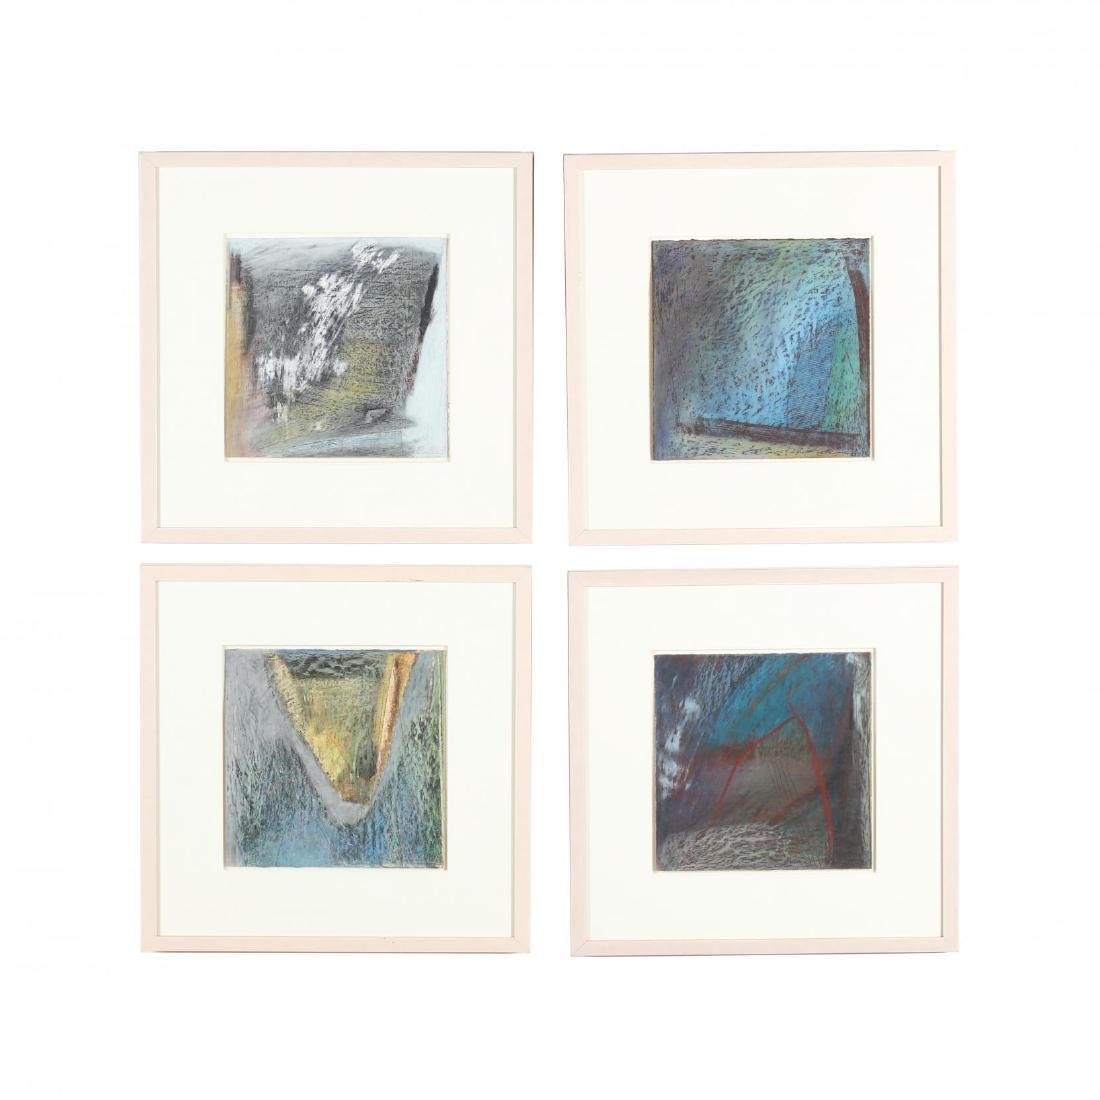 Herb Jackson (NC, b. 1945), Four Works on Paper